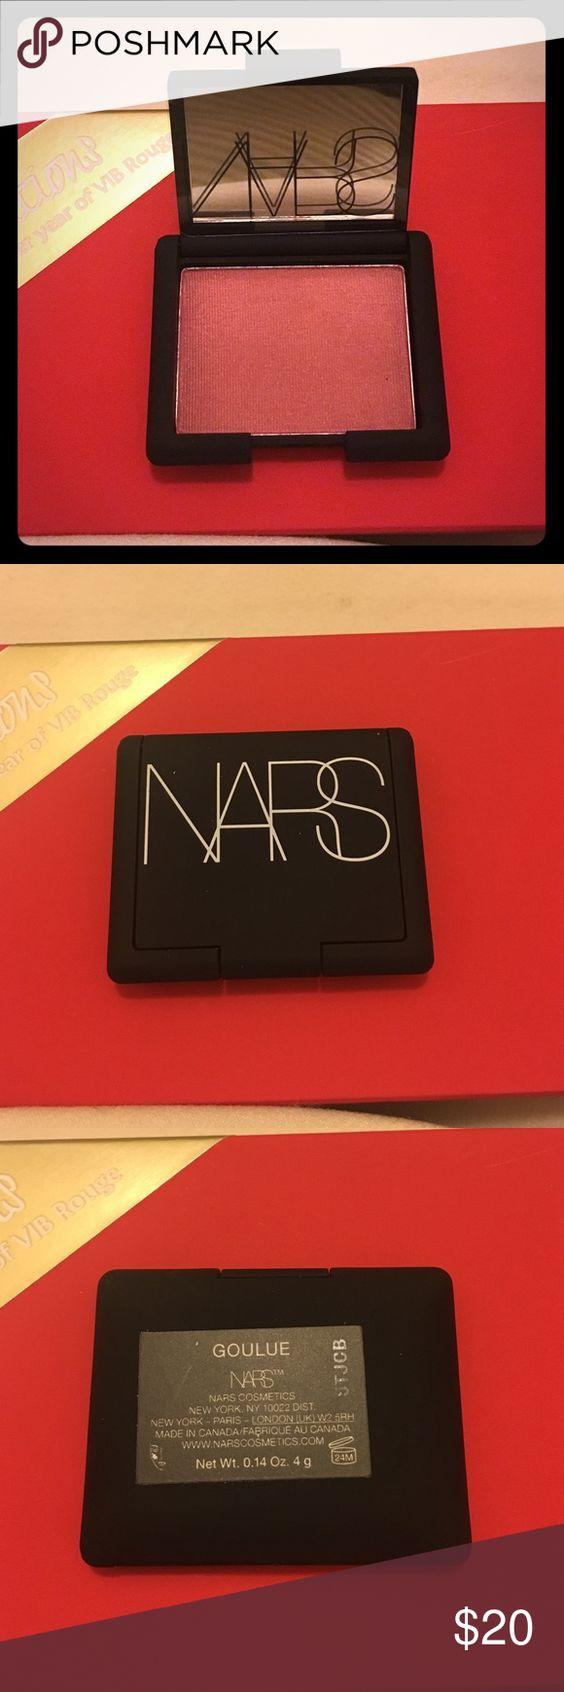 NARS blush Sephora Exclusive - in Goulue Net wt 0.14 oz (4 g) each + 2 45min beauty makeover @ Sephora NARS Makeup Blush